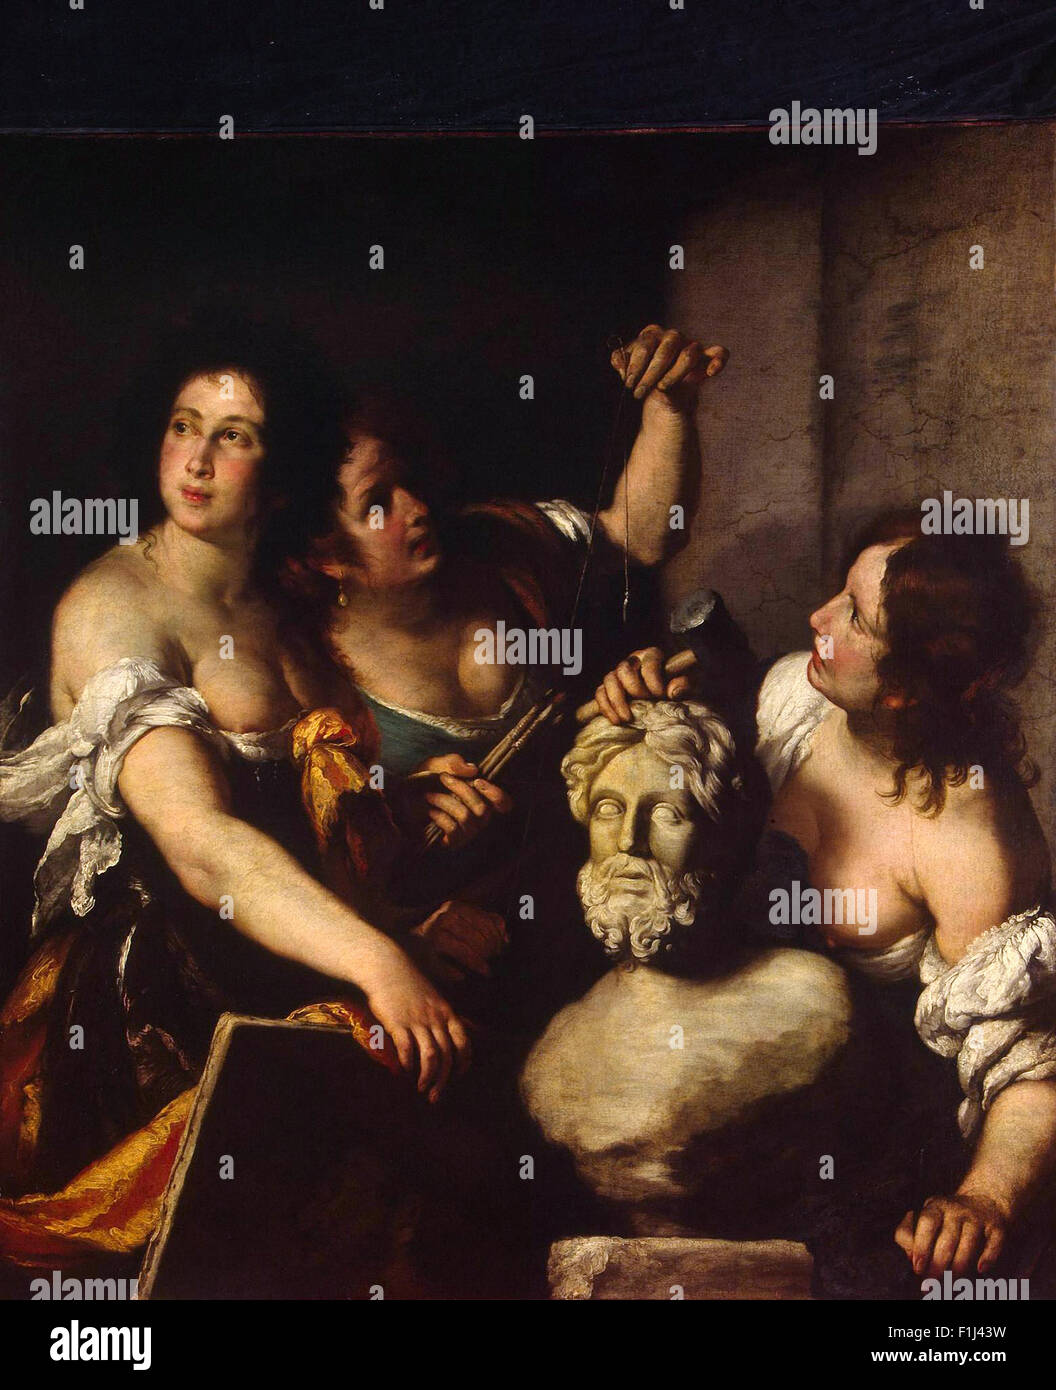 Bernardo Strozzi - Allegory of the Arts - Stock Image